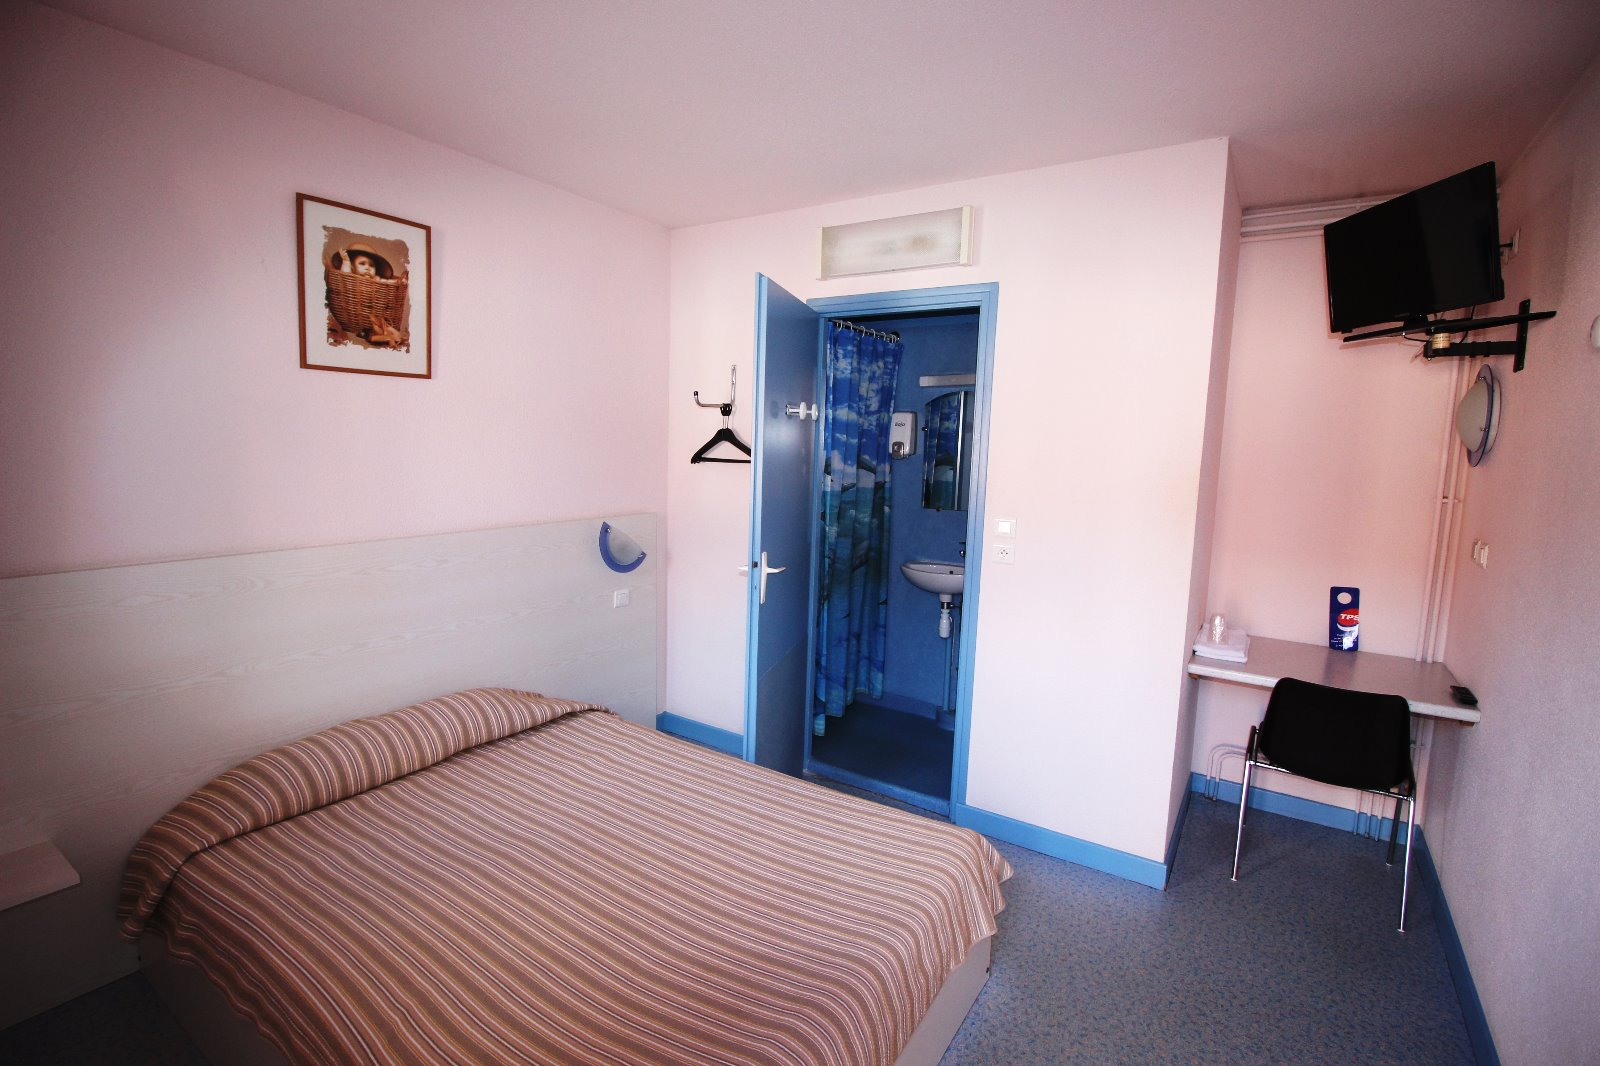 Hotel Proche Lons Le Saunier